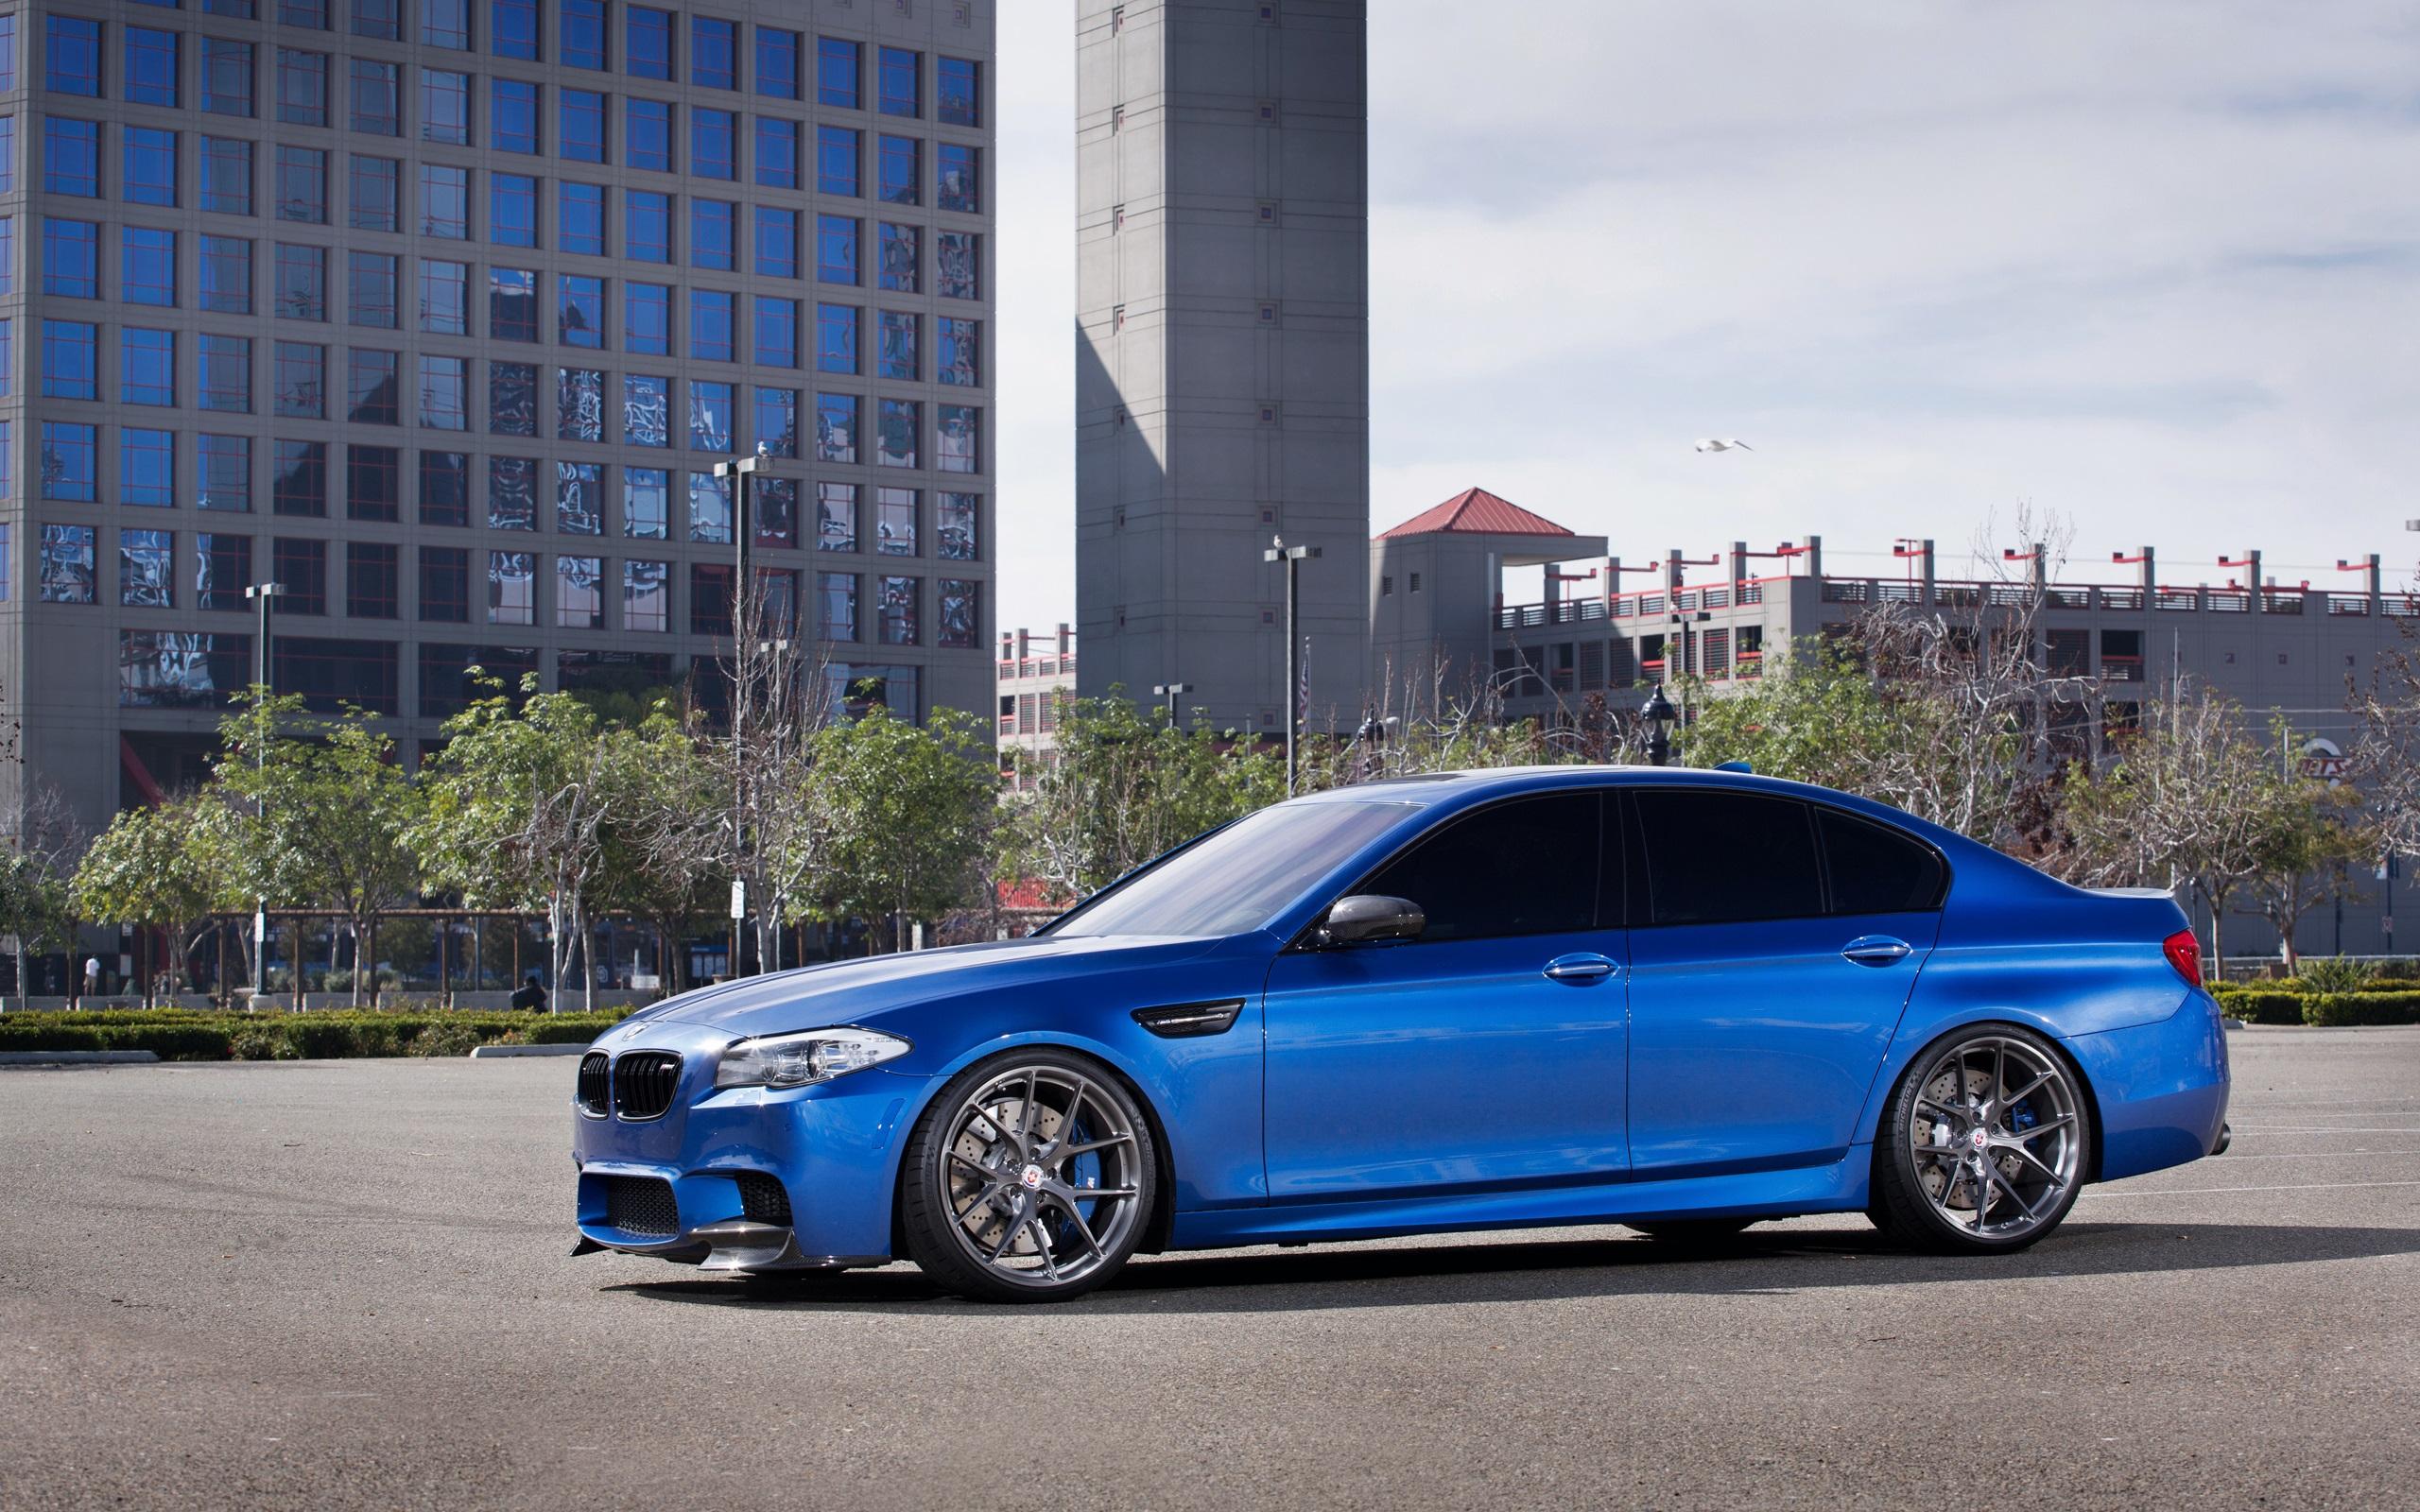 Wallpaper Bmw M5 F10 Blue Car Buildings 2560x1600 Hd Picture Image